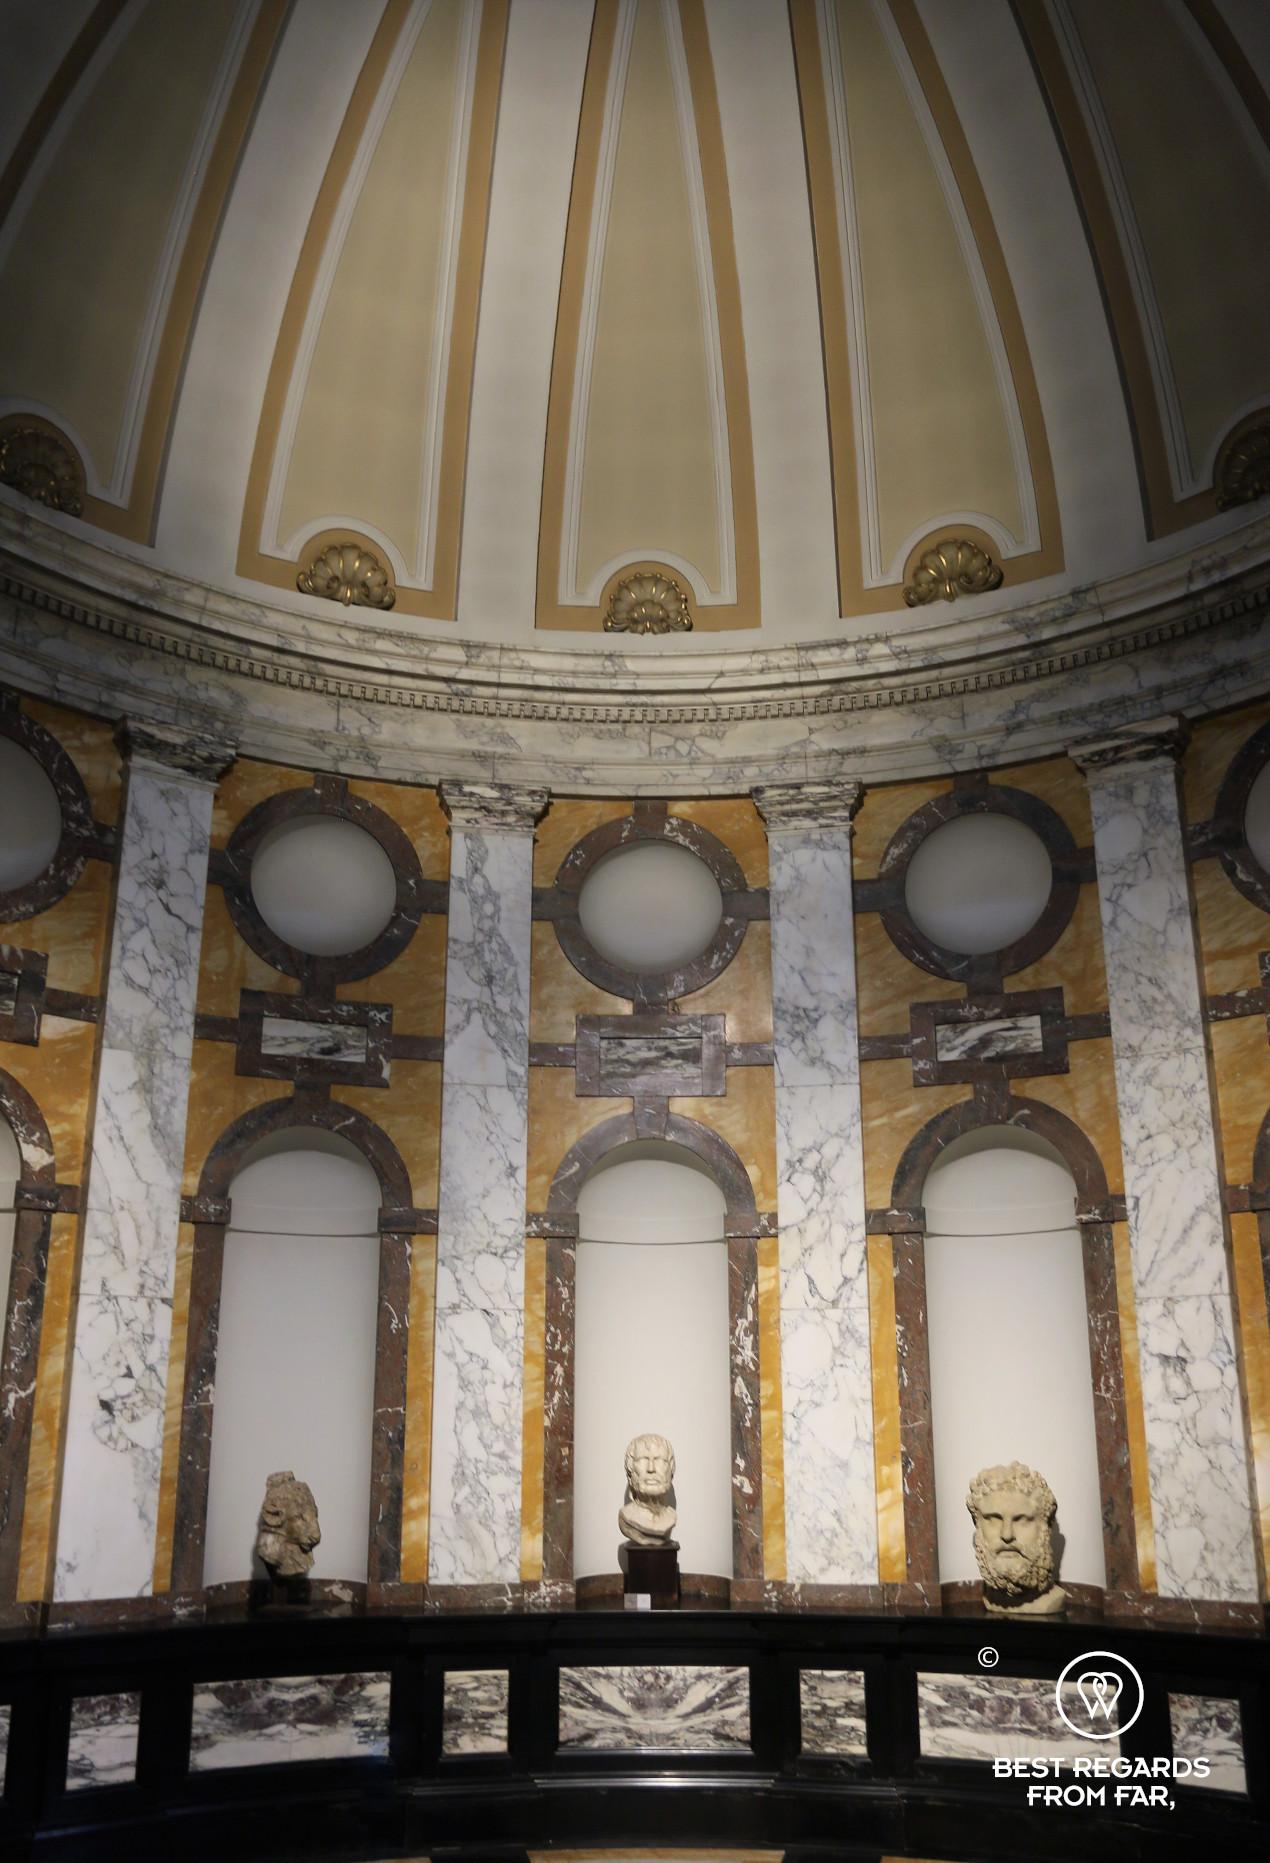 Roman statues in Rubens' gallery, Rubens' House, Antwerp